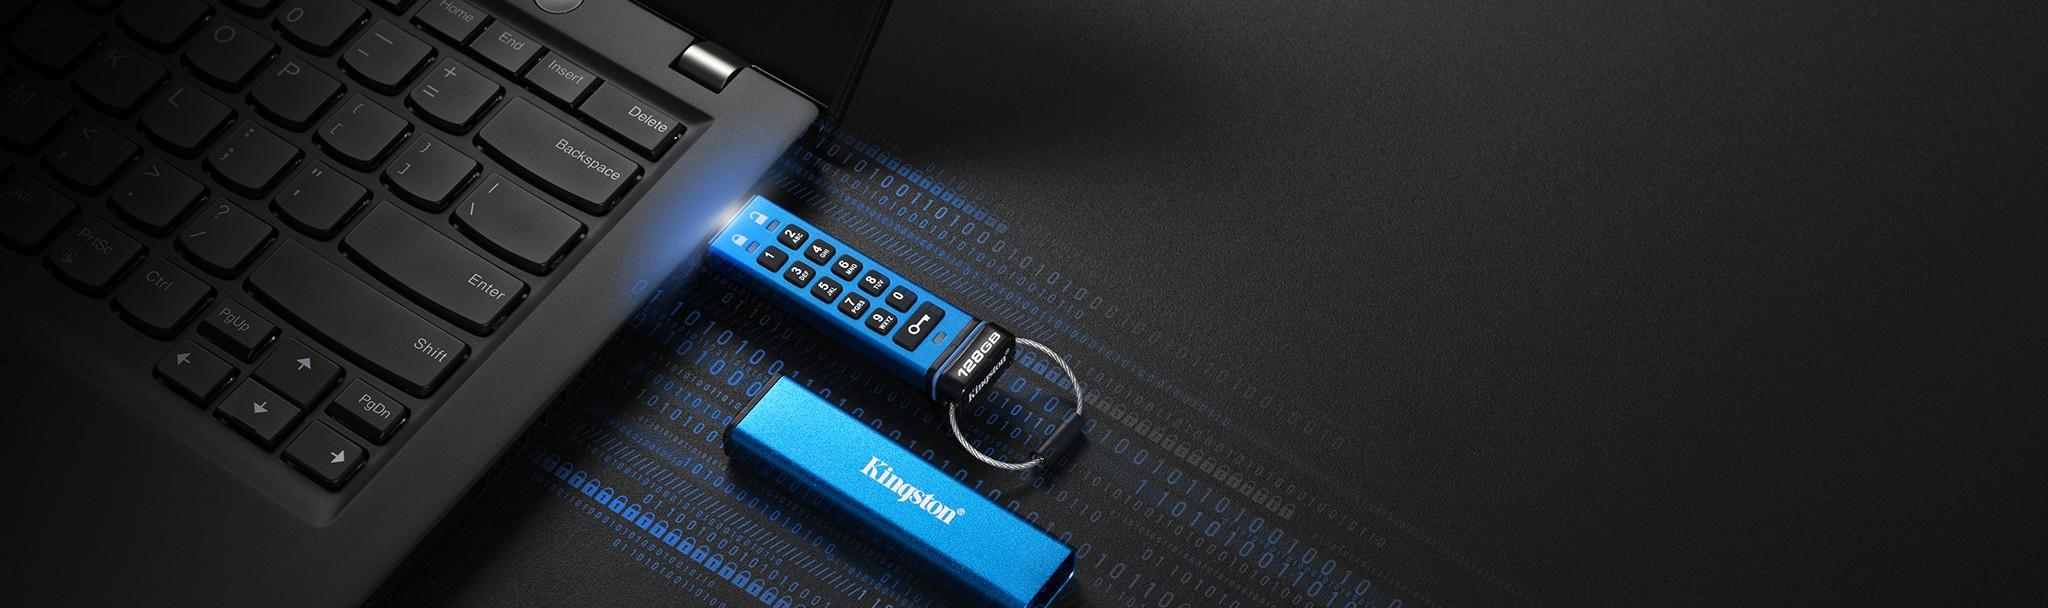 Alphanumeric keypad